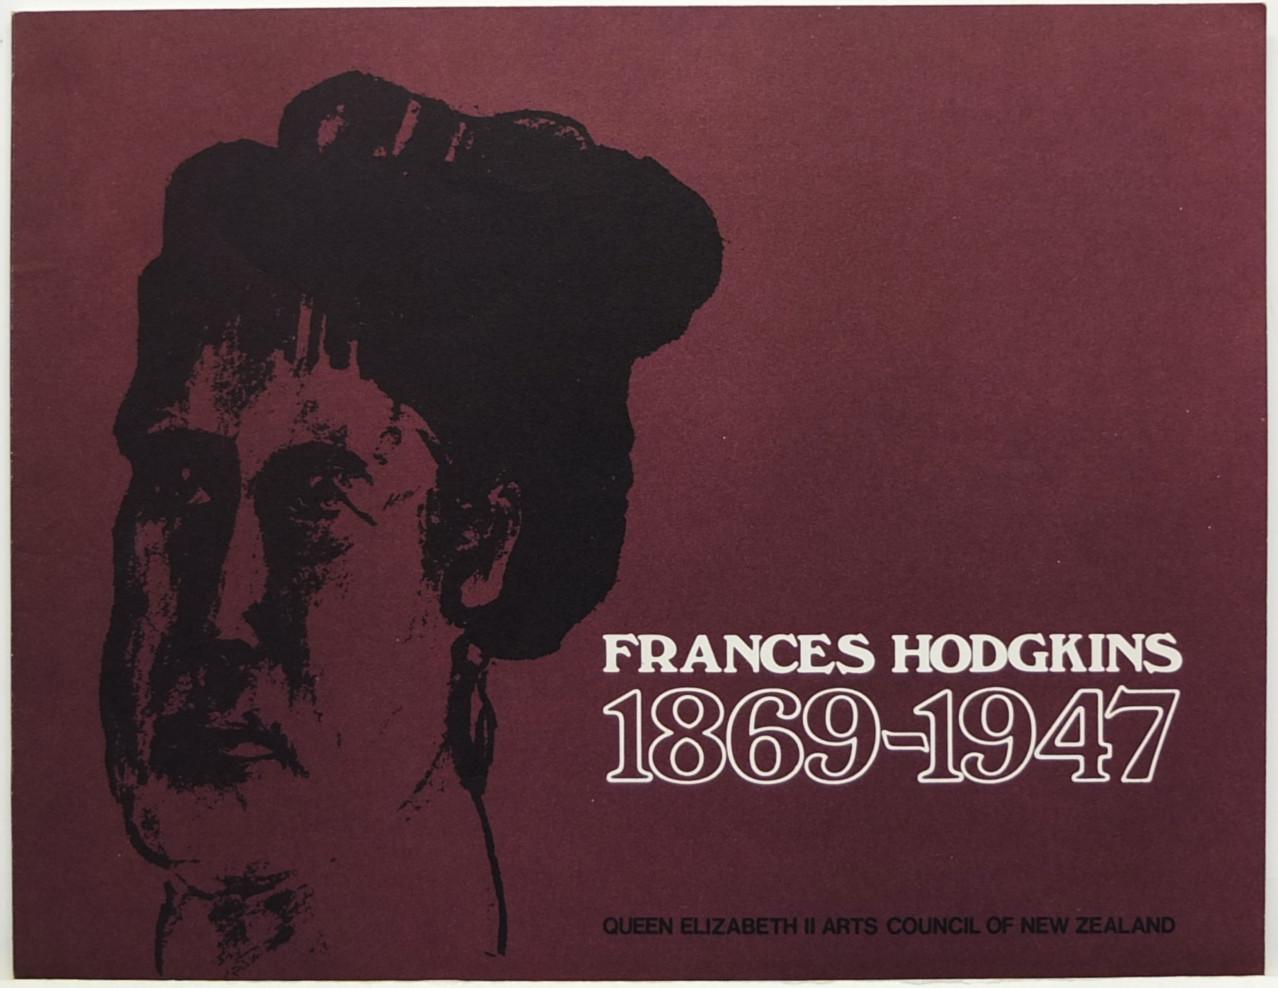 Frances Hodgkins 1869-1947